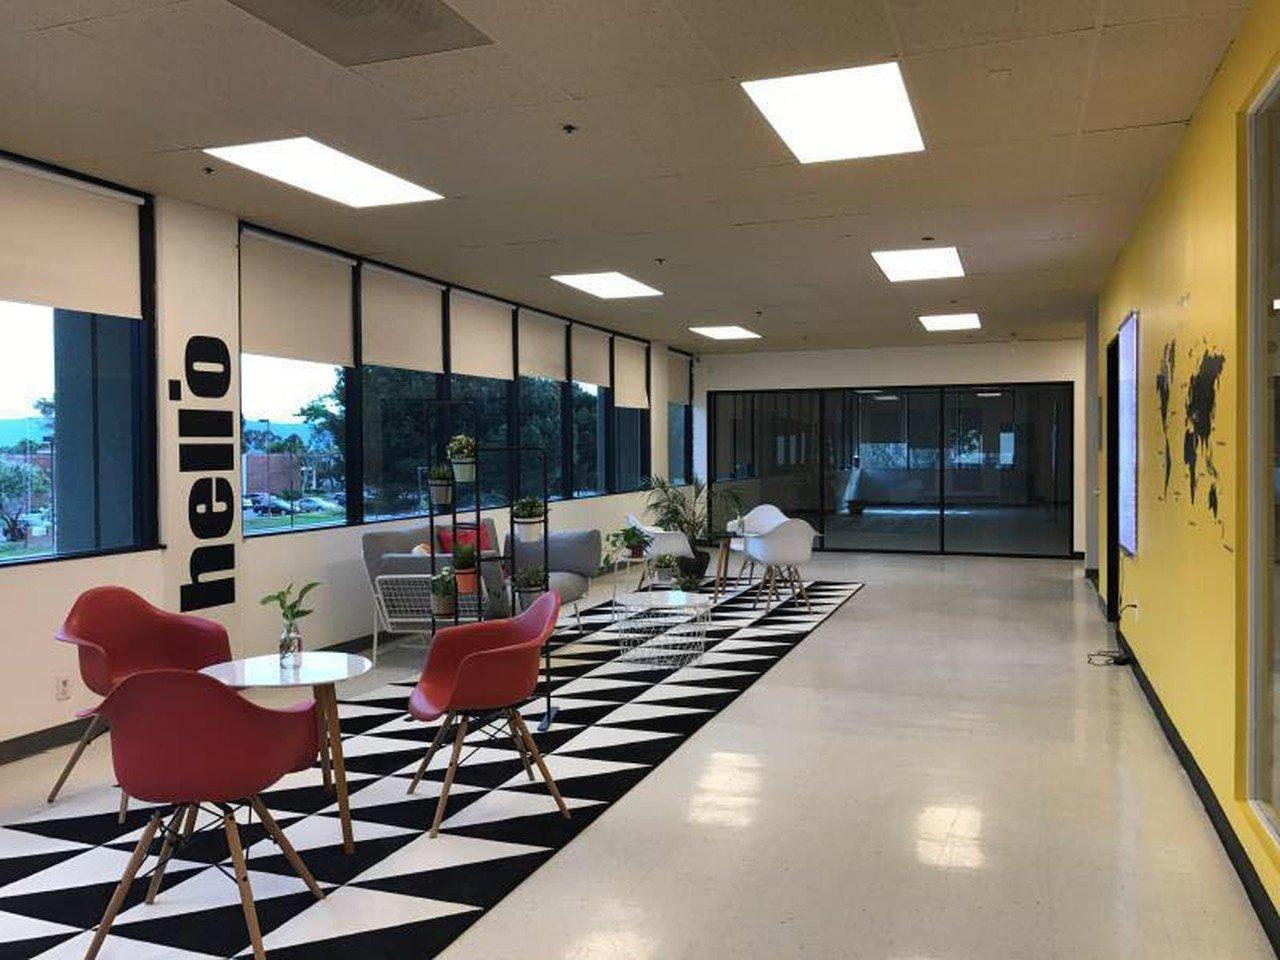 San Francisco  Coworking space Dobe USA Inc single working room image 10